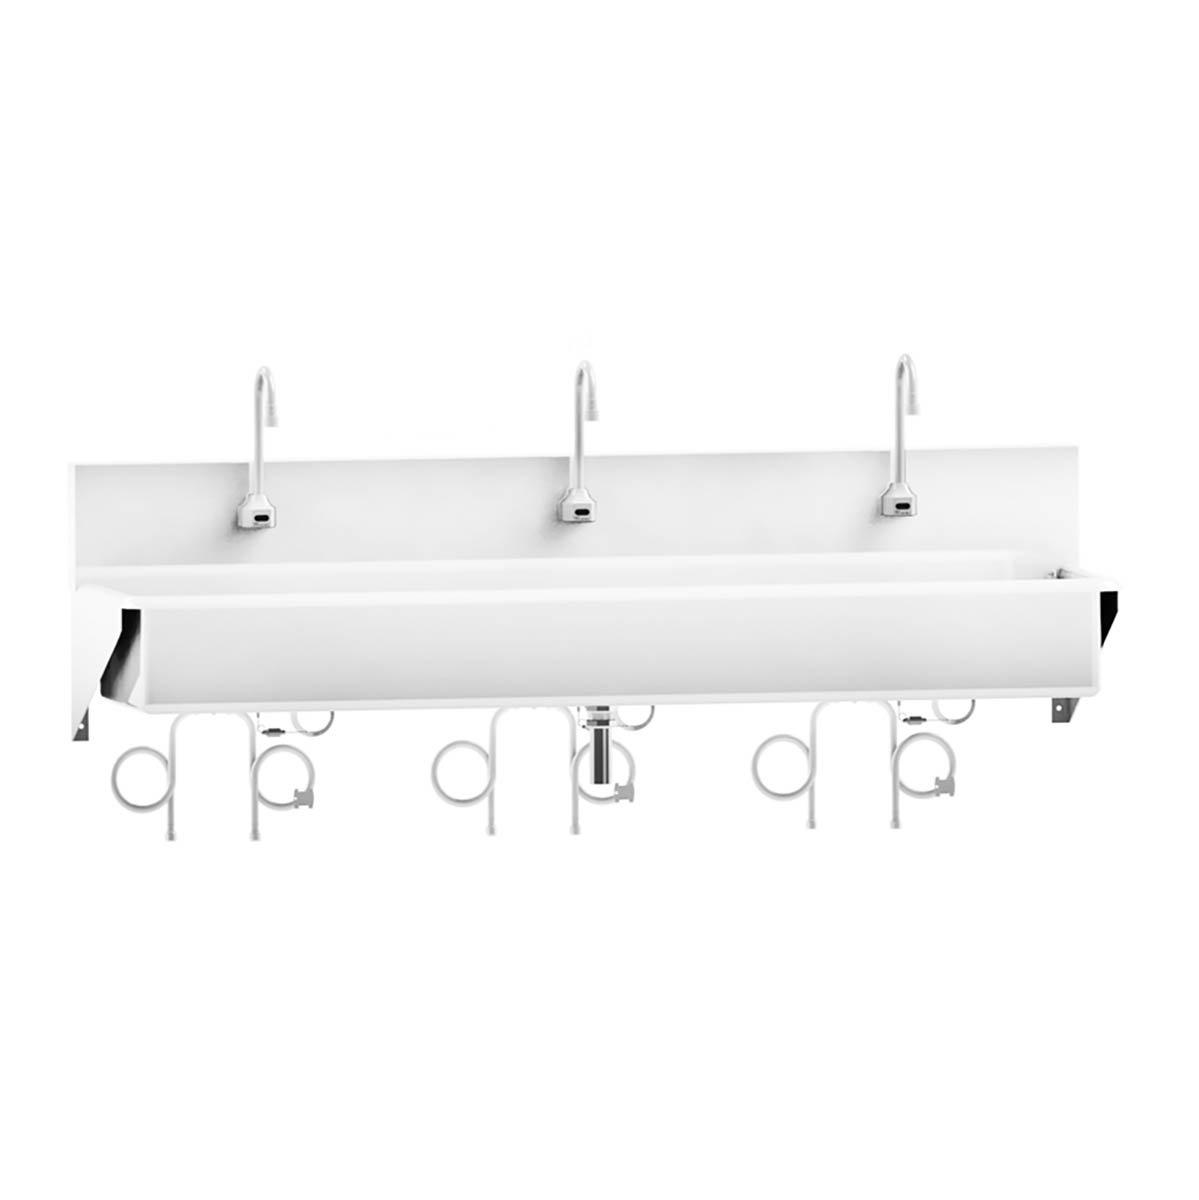 Windsor Scrub Sink - Triple-Place Infrared Sensor Control - 69